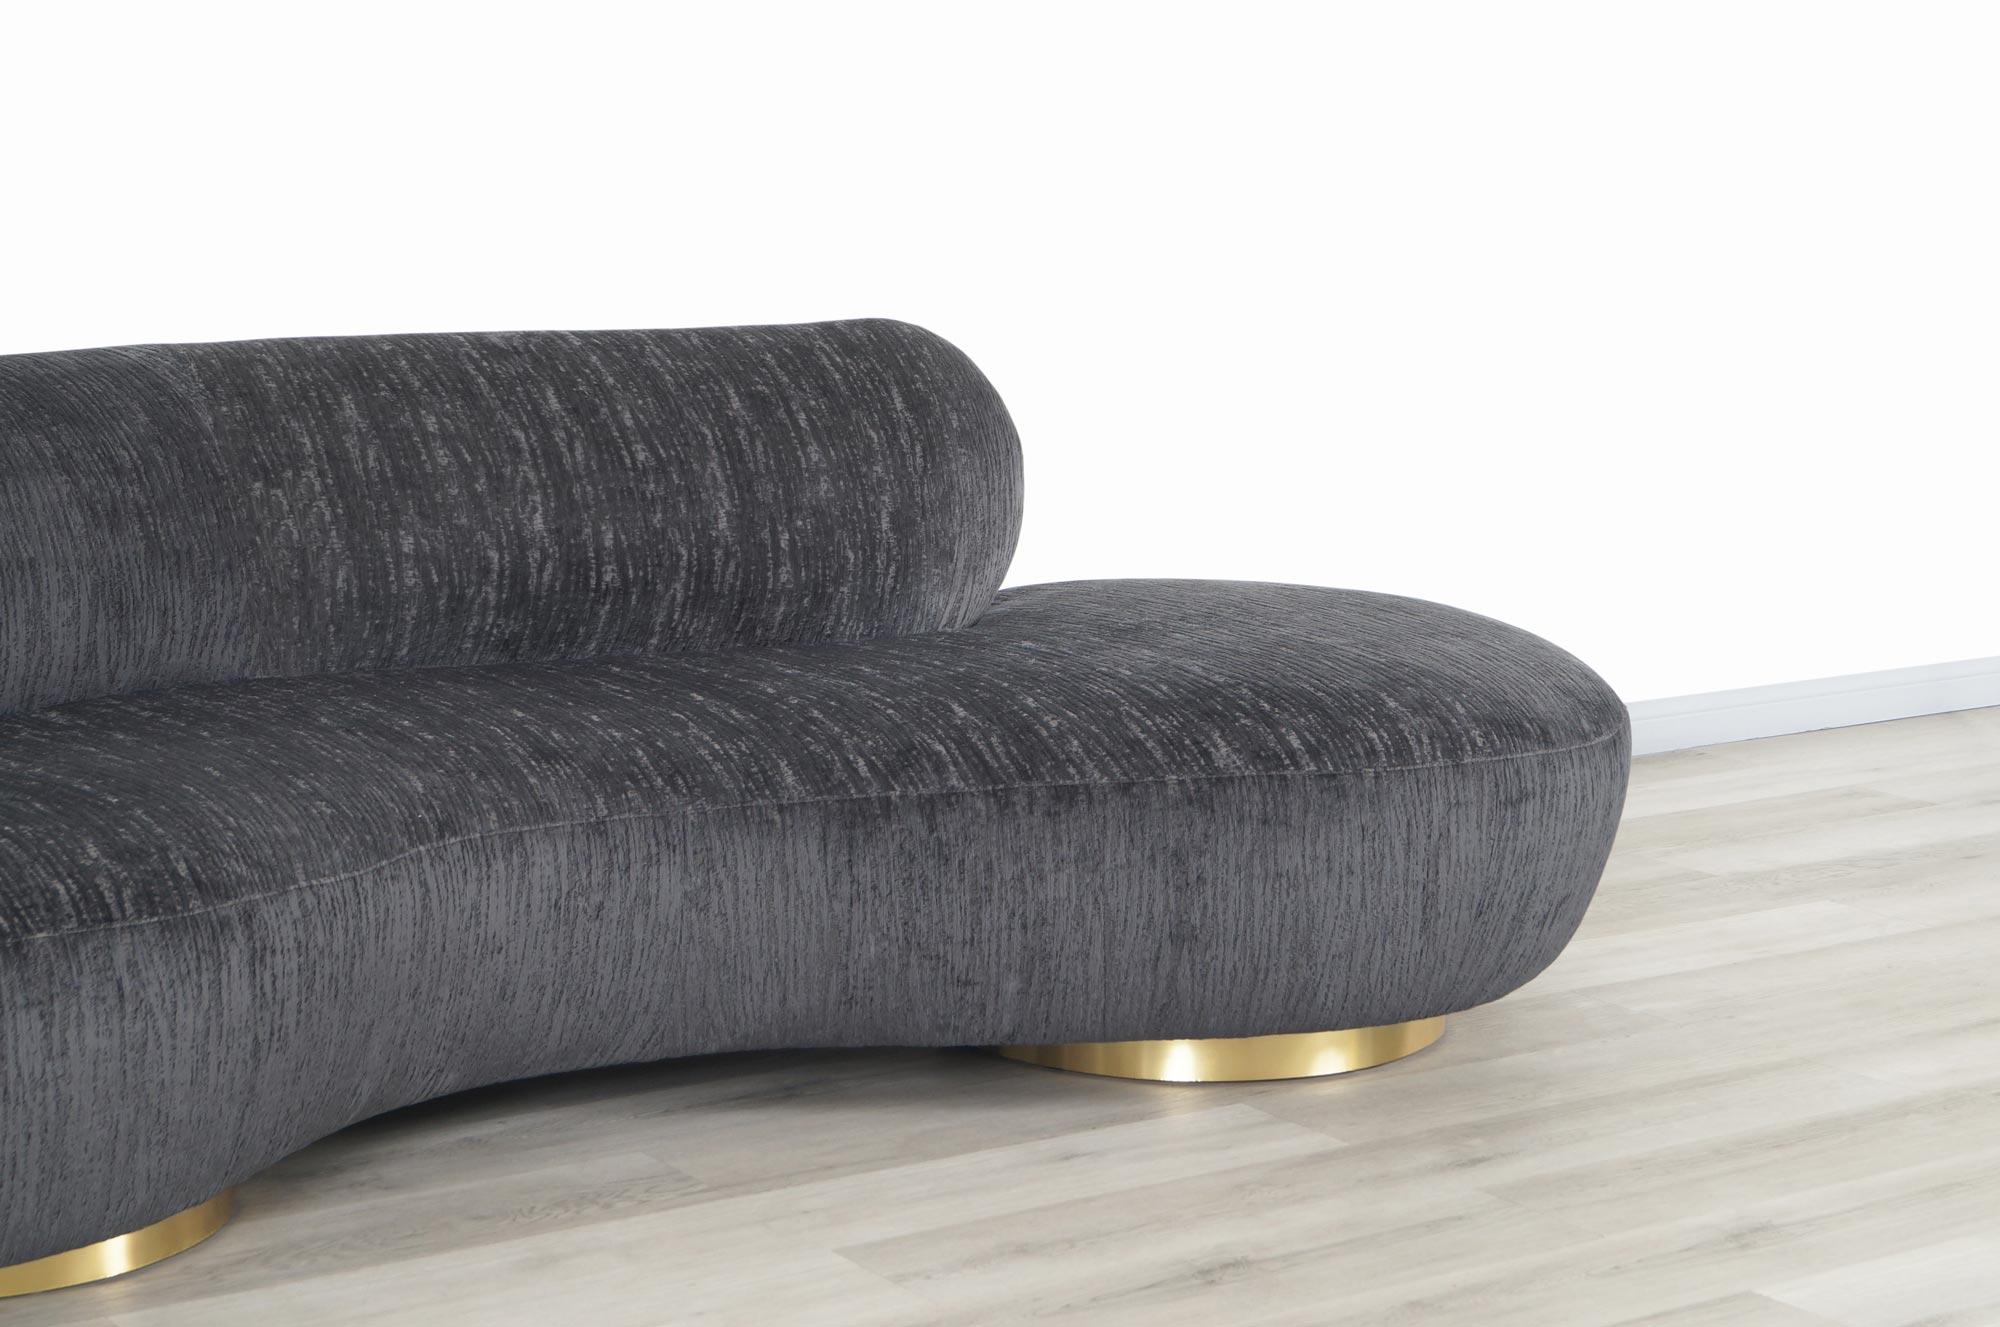 Vintage Brass Serpentine Sofa by Vladimir Kagan